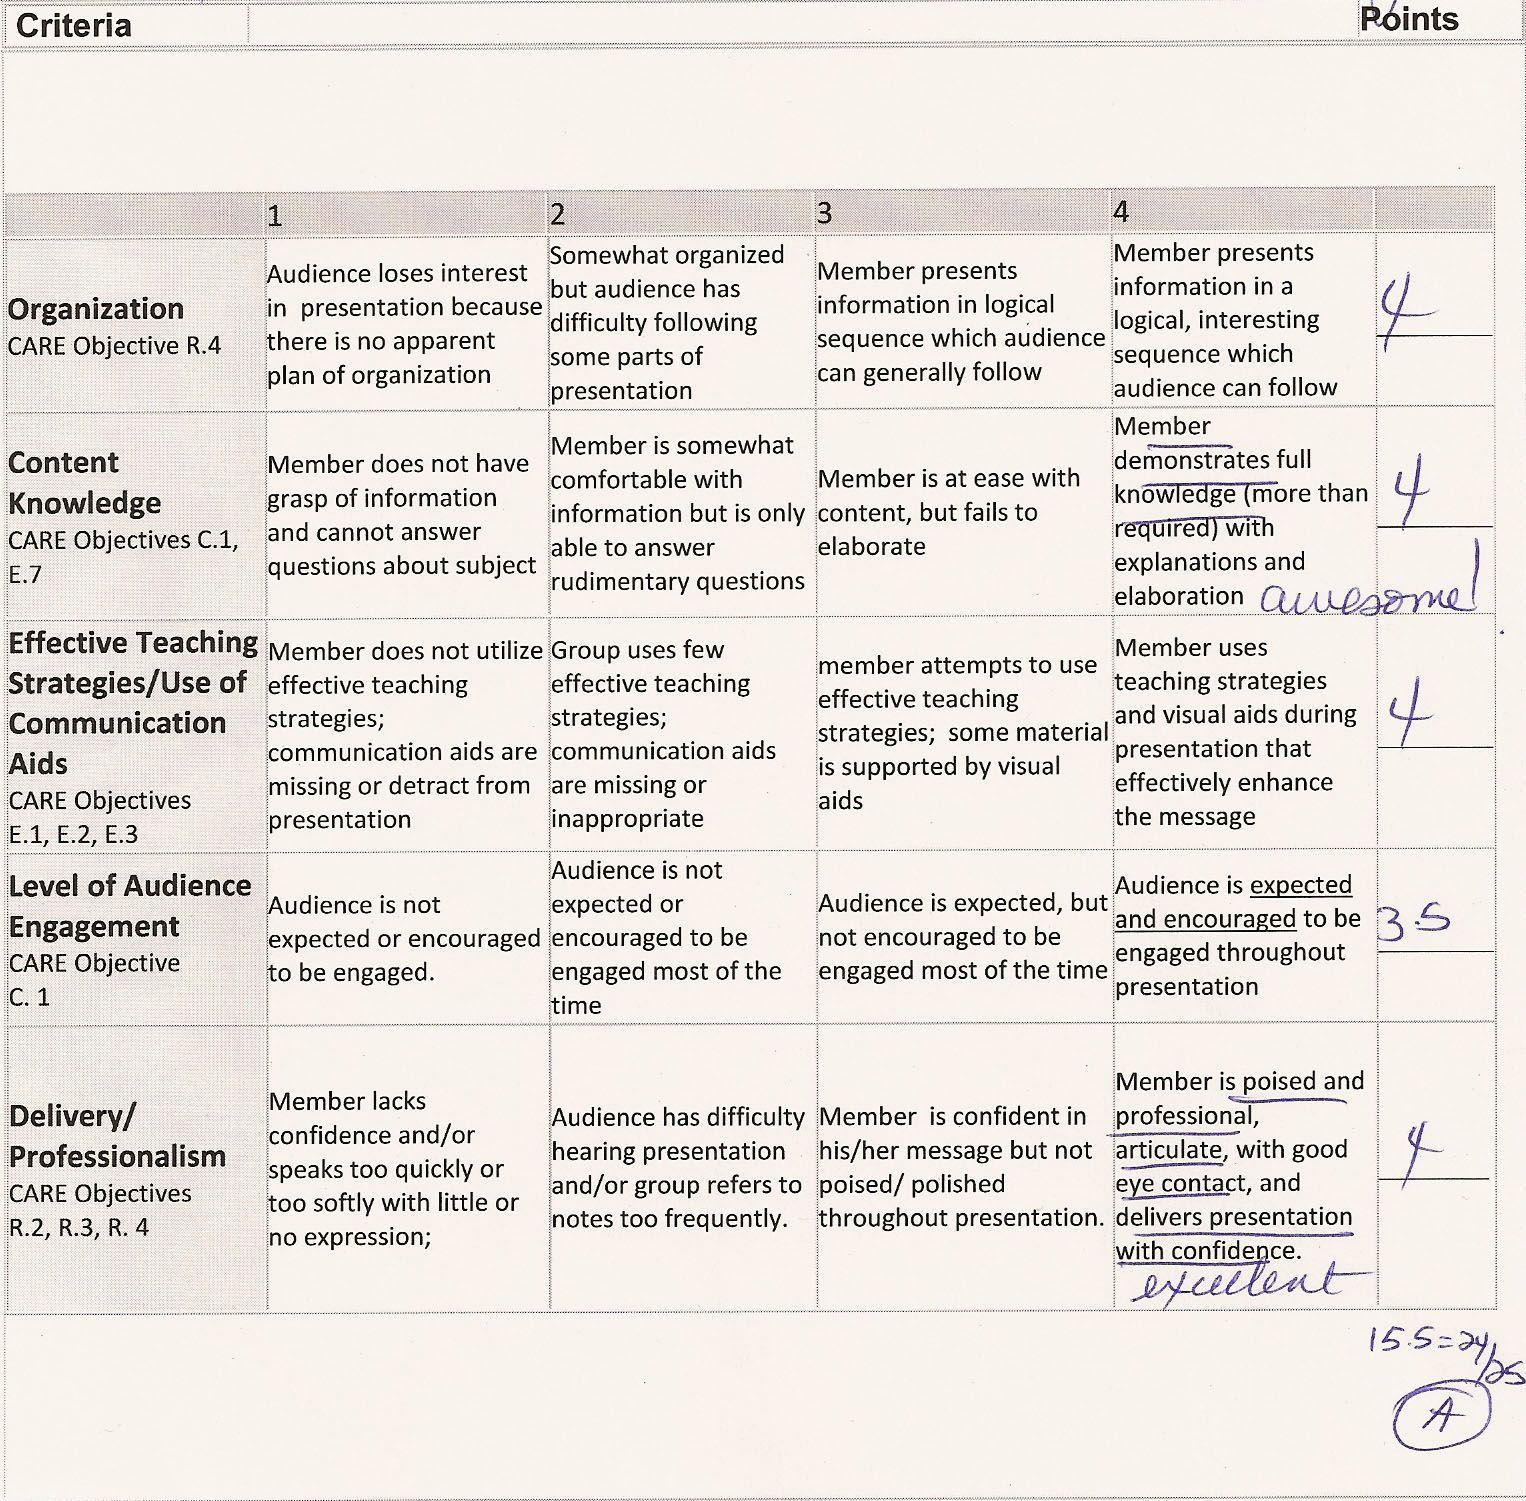 018 Professionalism Essay Sensational Pdf Conclusion Teacher Full